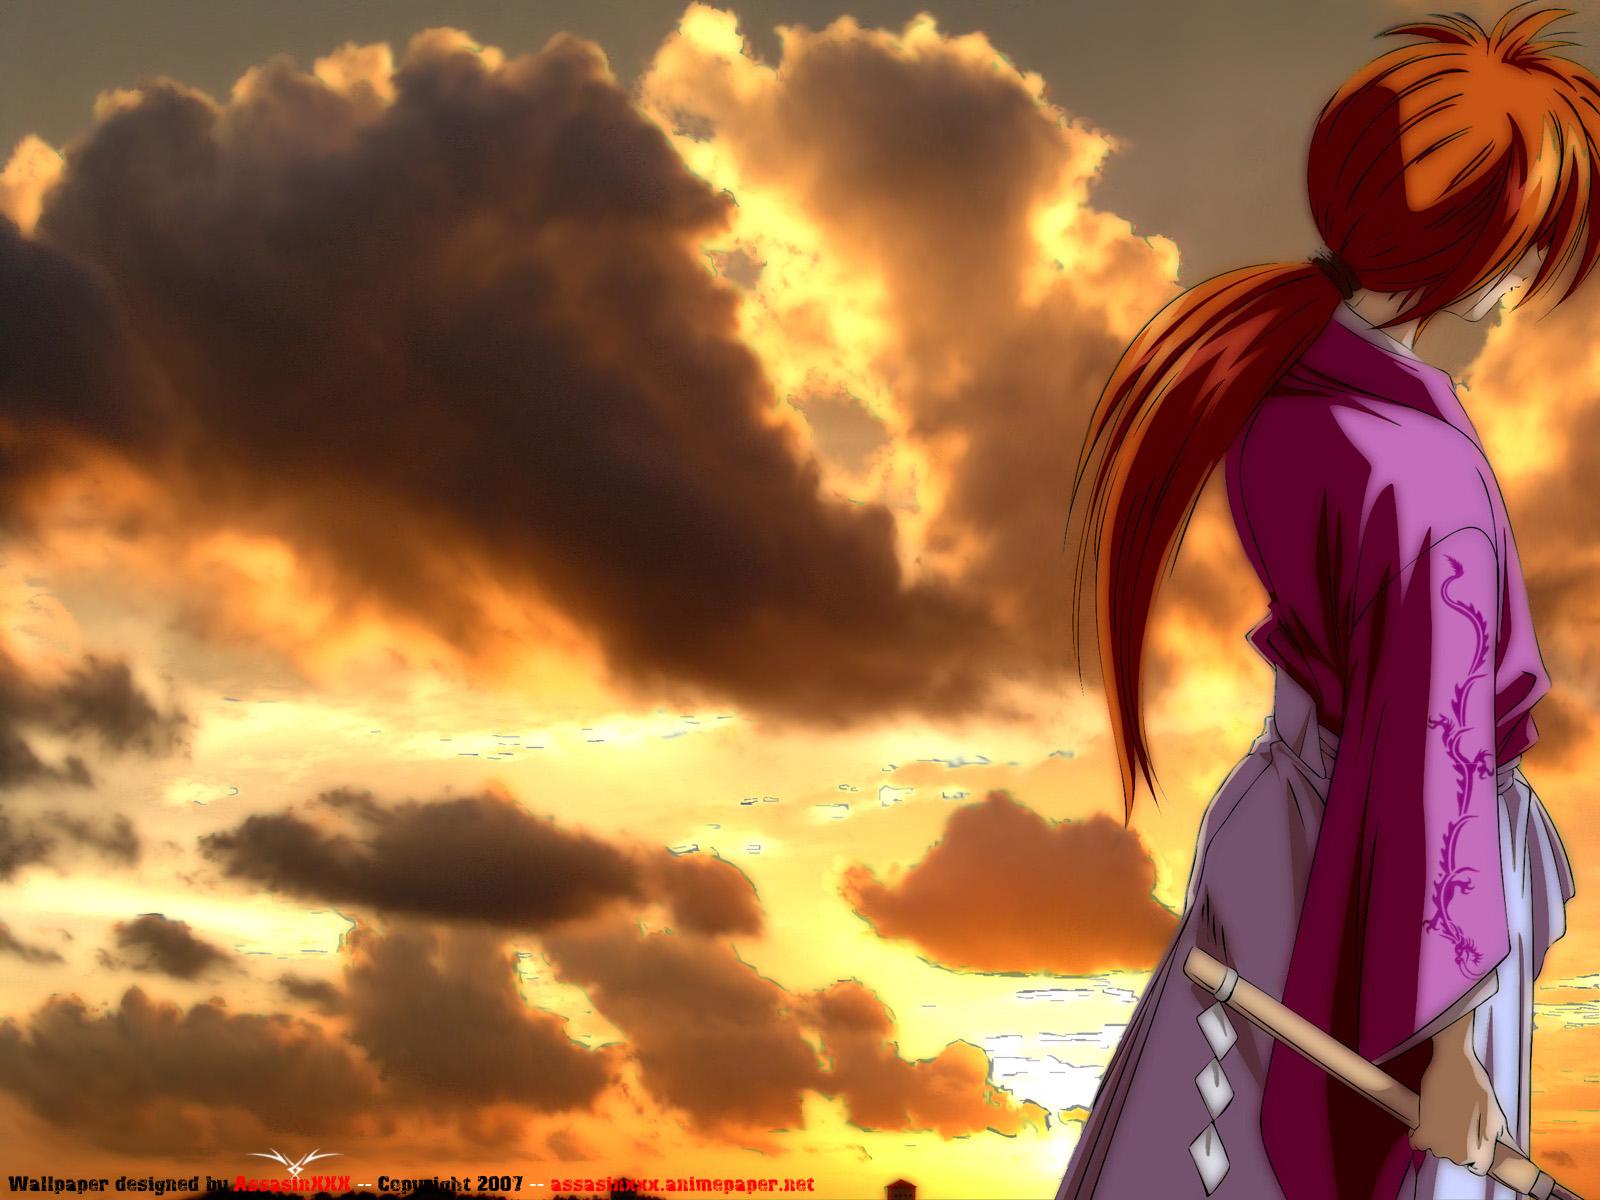 43 ] Rurouni Kenshin Wallpaper HD On WallpaperSafari